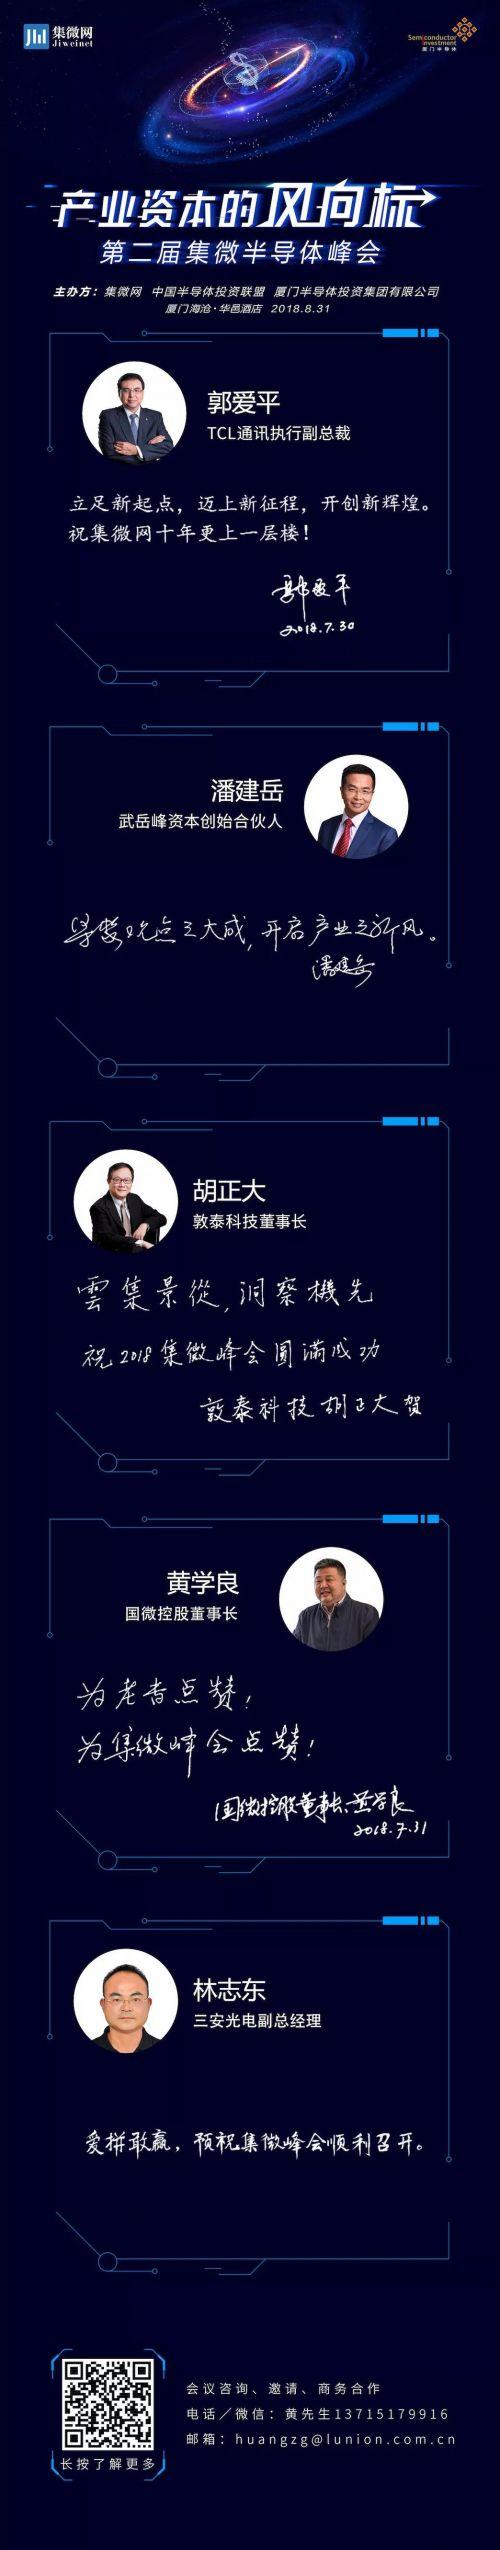 Arm吴雄昂、黄汪、石磊、张世龙、林永育寄语峰会7